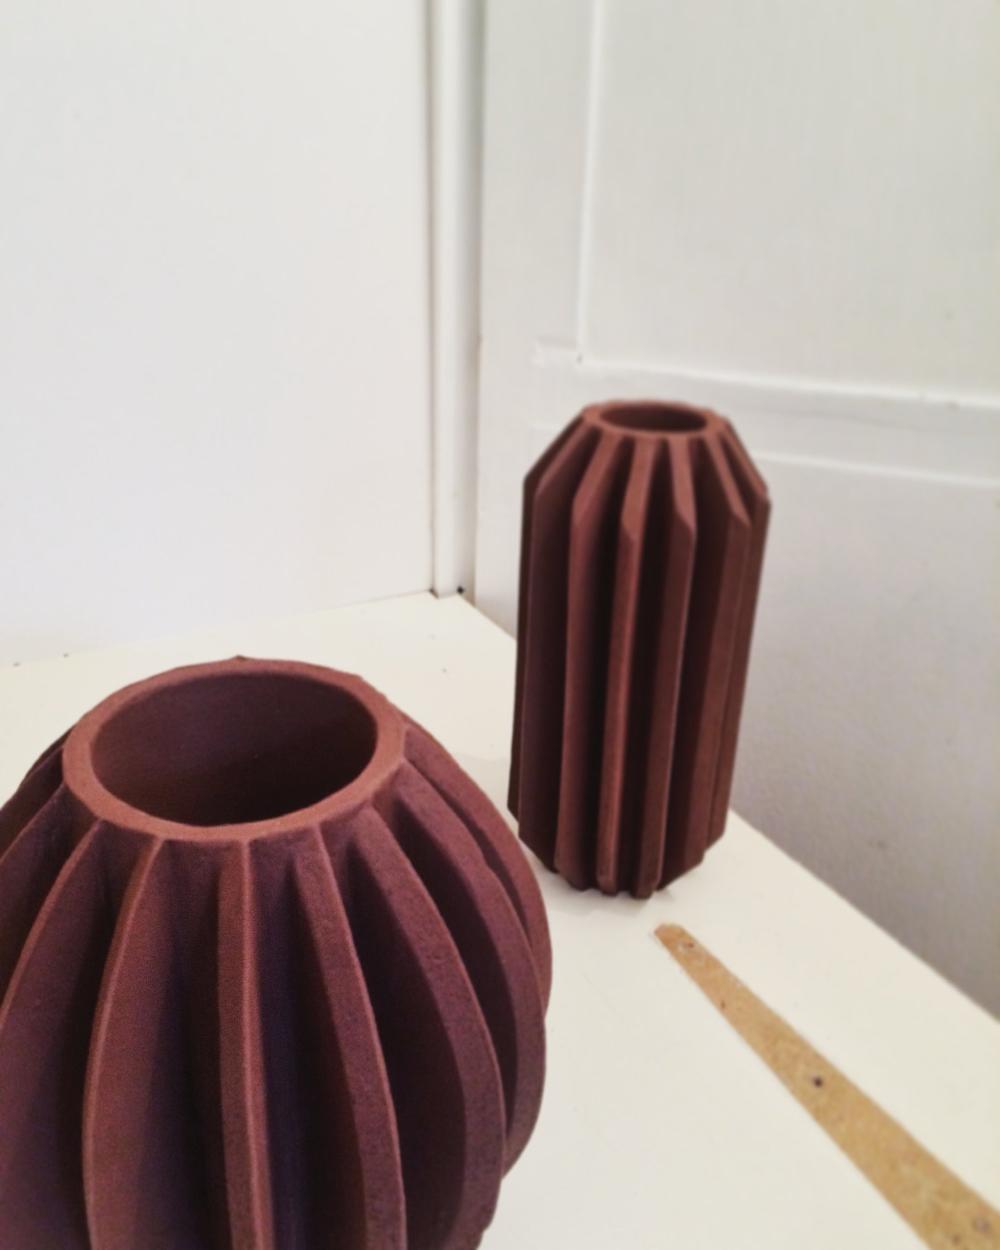 Latest Work - Ceramic Artist & Pottery Classes in Sheffield — Andrew Walker Ceramics Sheffield Pottery Classes & Ceramics Studio #potteryclasses